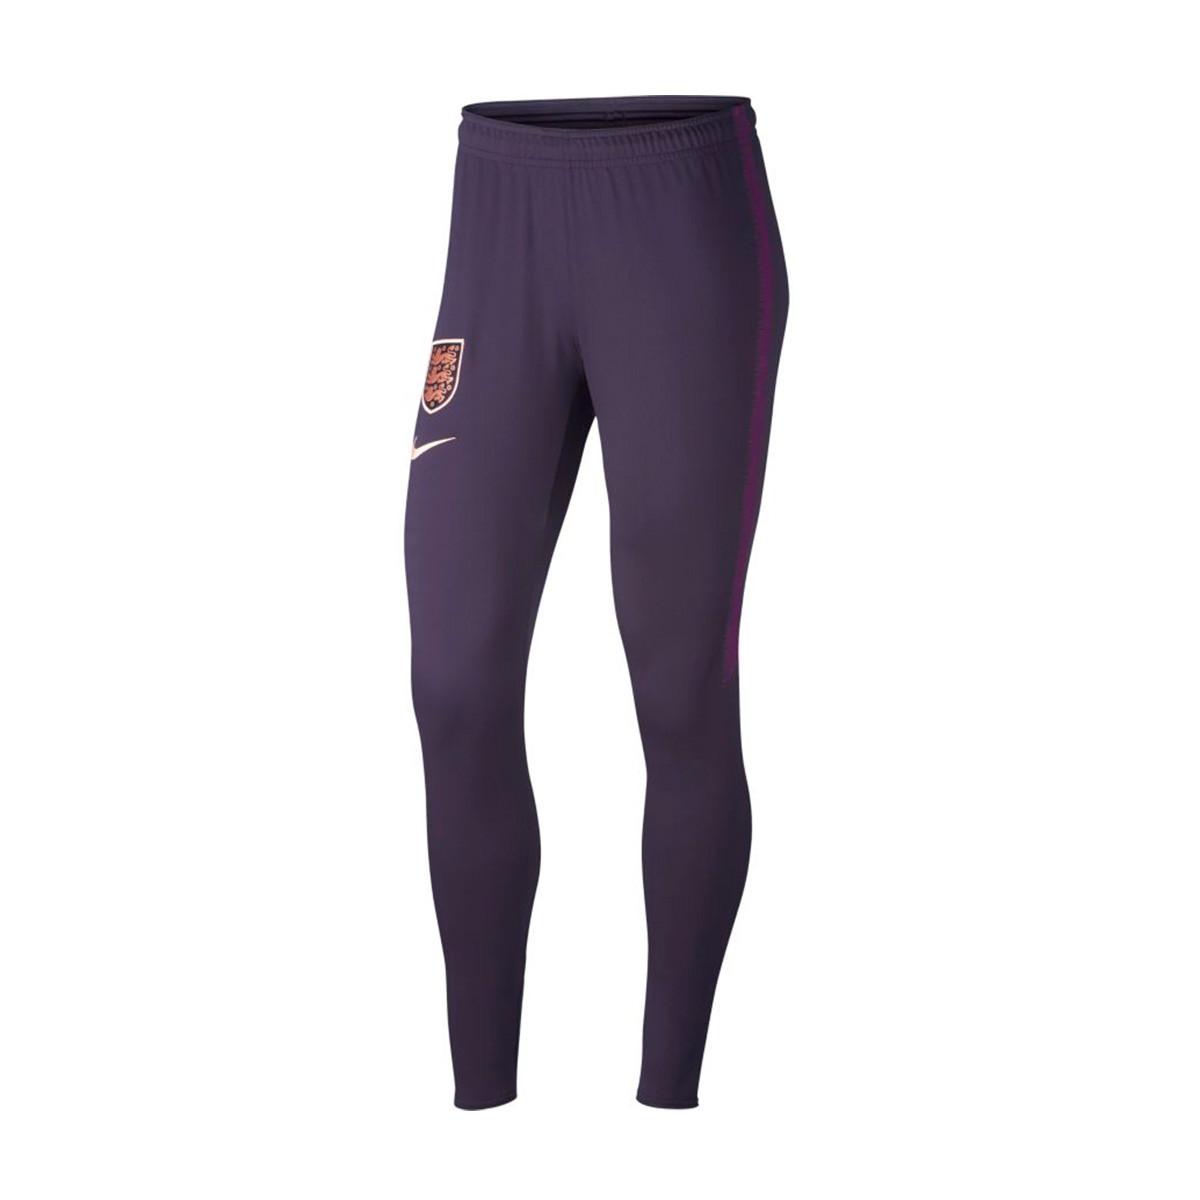 buy popular 3c407 e8be4 Pantalón largo Seleccion Inglaterra Dry Squad WWC 2019 Mujer Purple  dynasty-Night purple